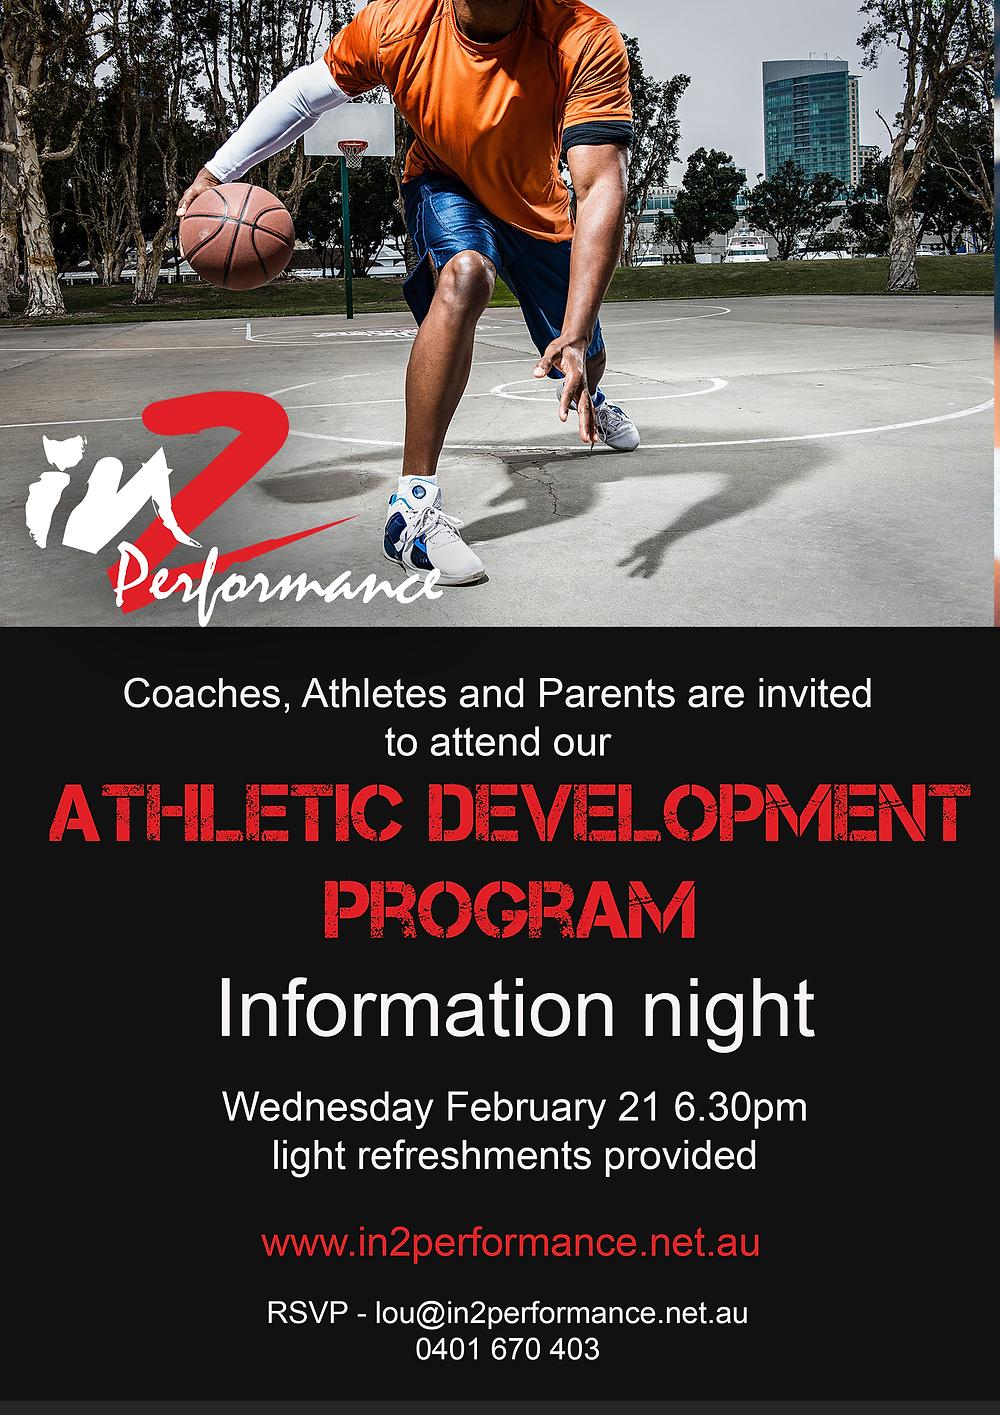 Athletic Development Program